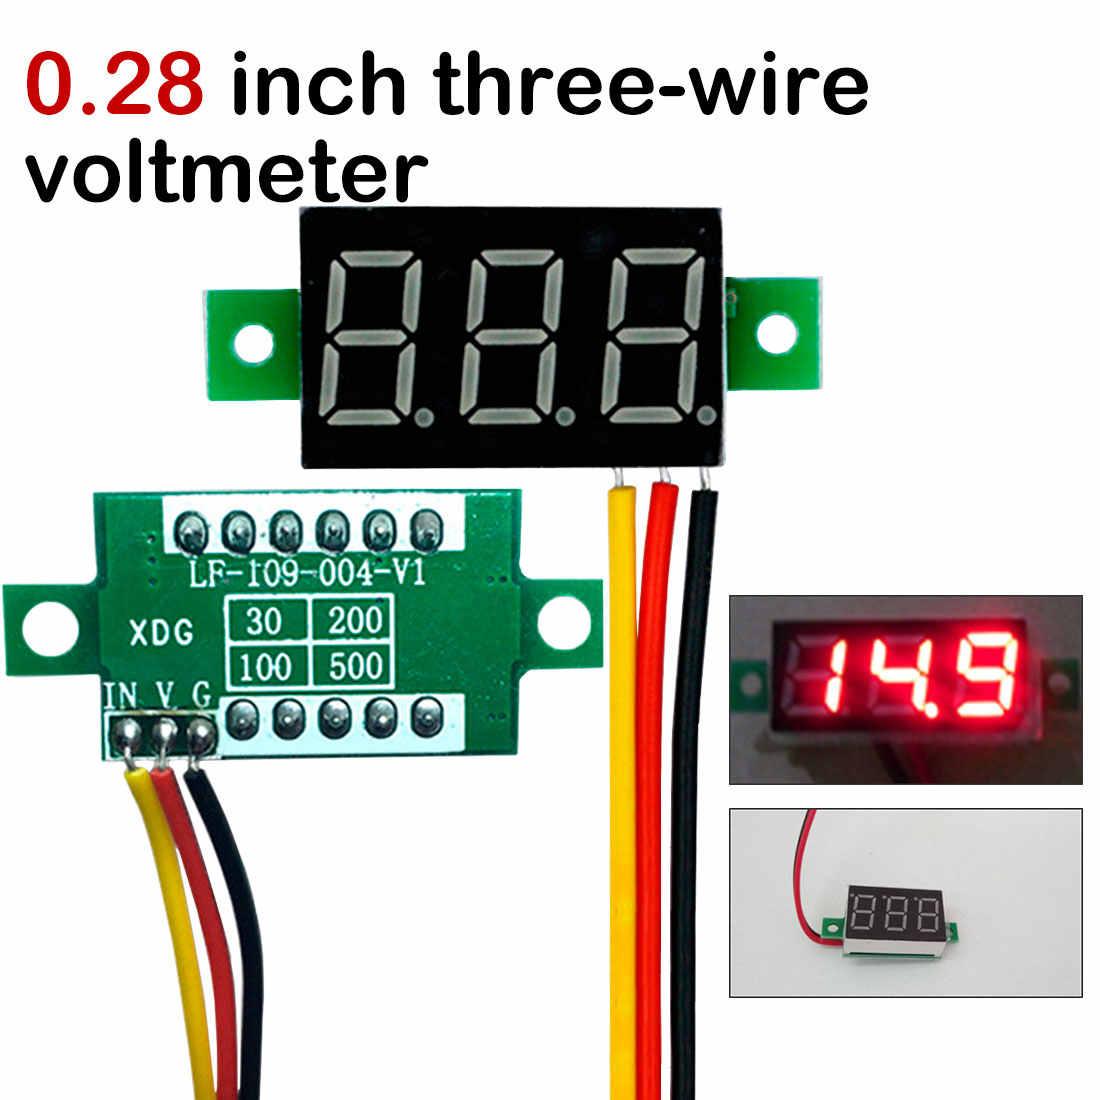 Detectors New Mini 3 Wires Panel Meter 3-Digital LED Display Voltage Voltmeter